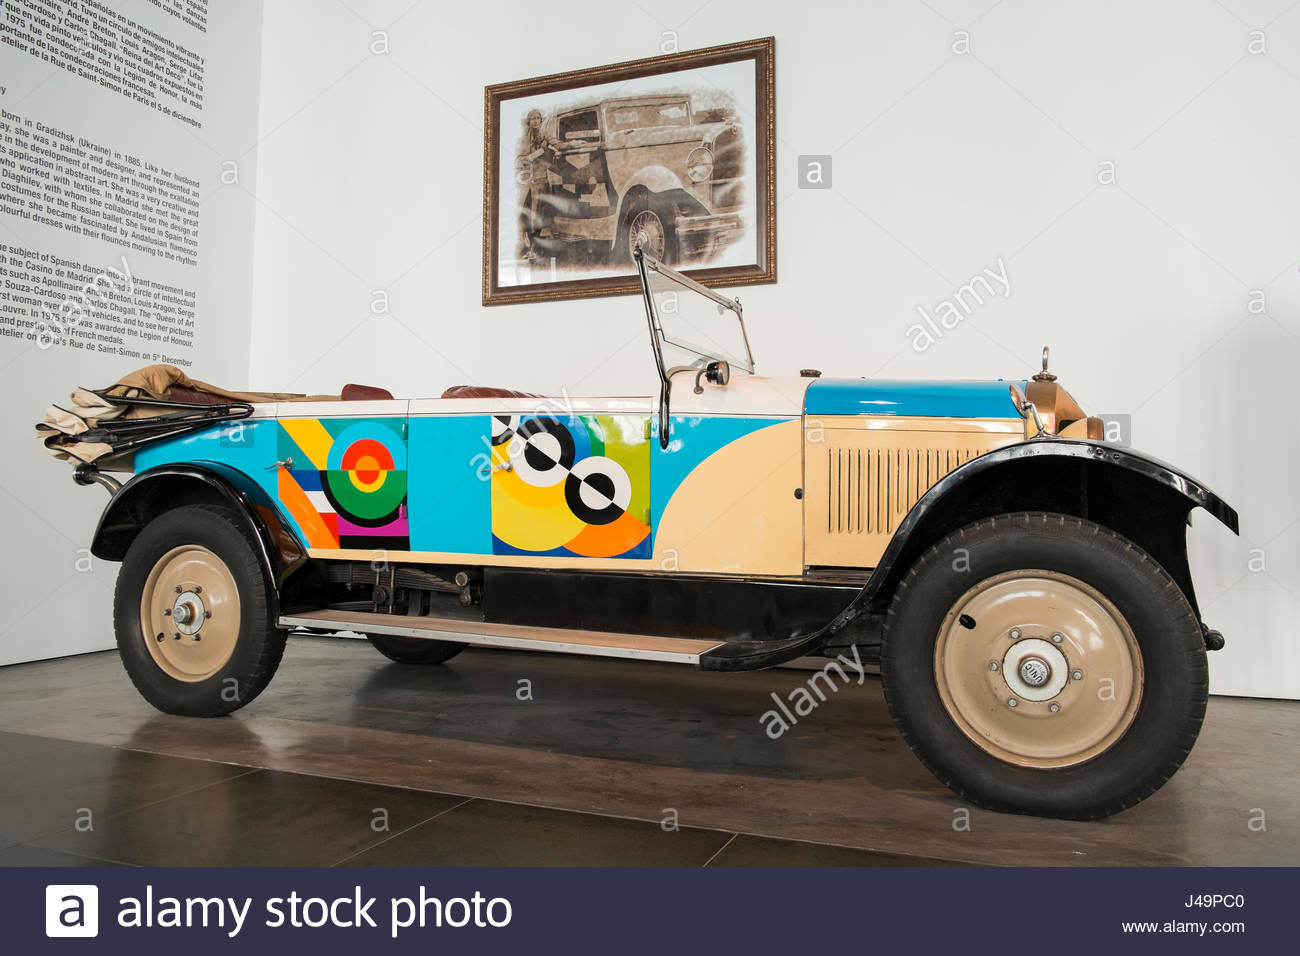 1920 Unic. Sonia Delaunay. Automobile museum of Málaga, Andalusia, Spain. - Stock Image